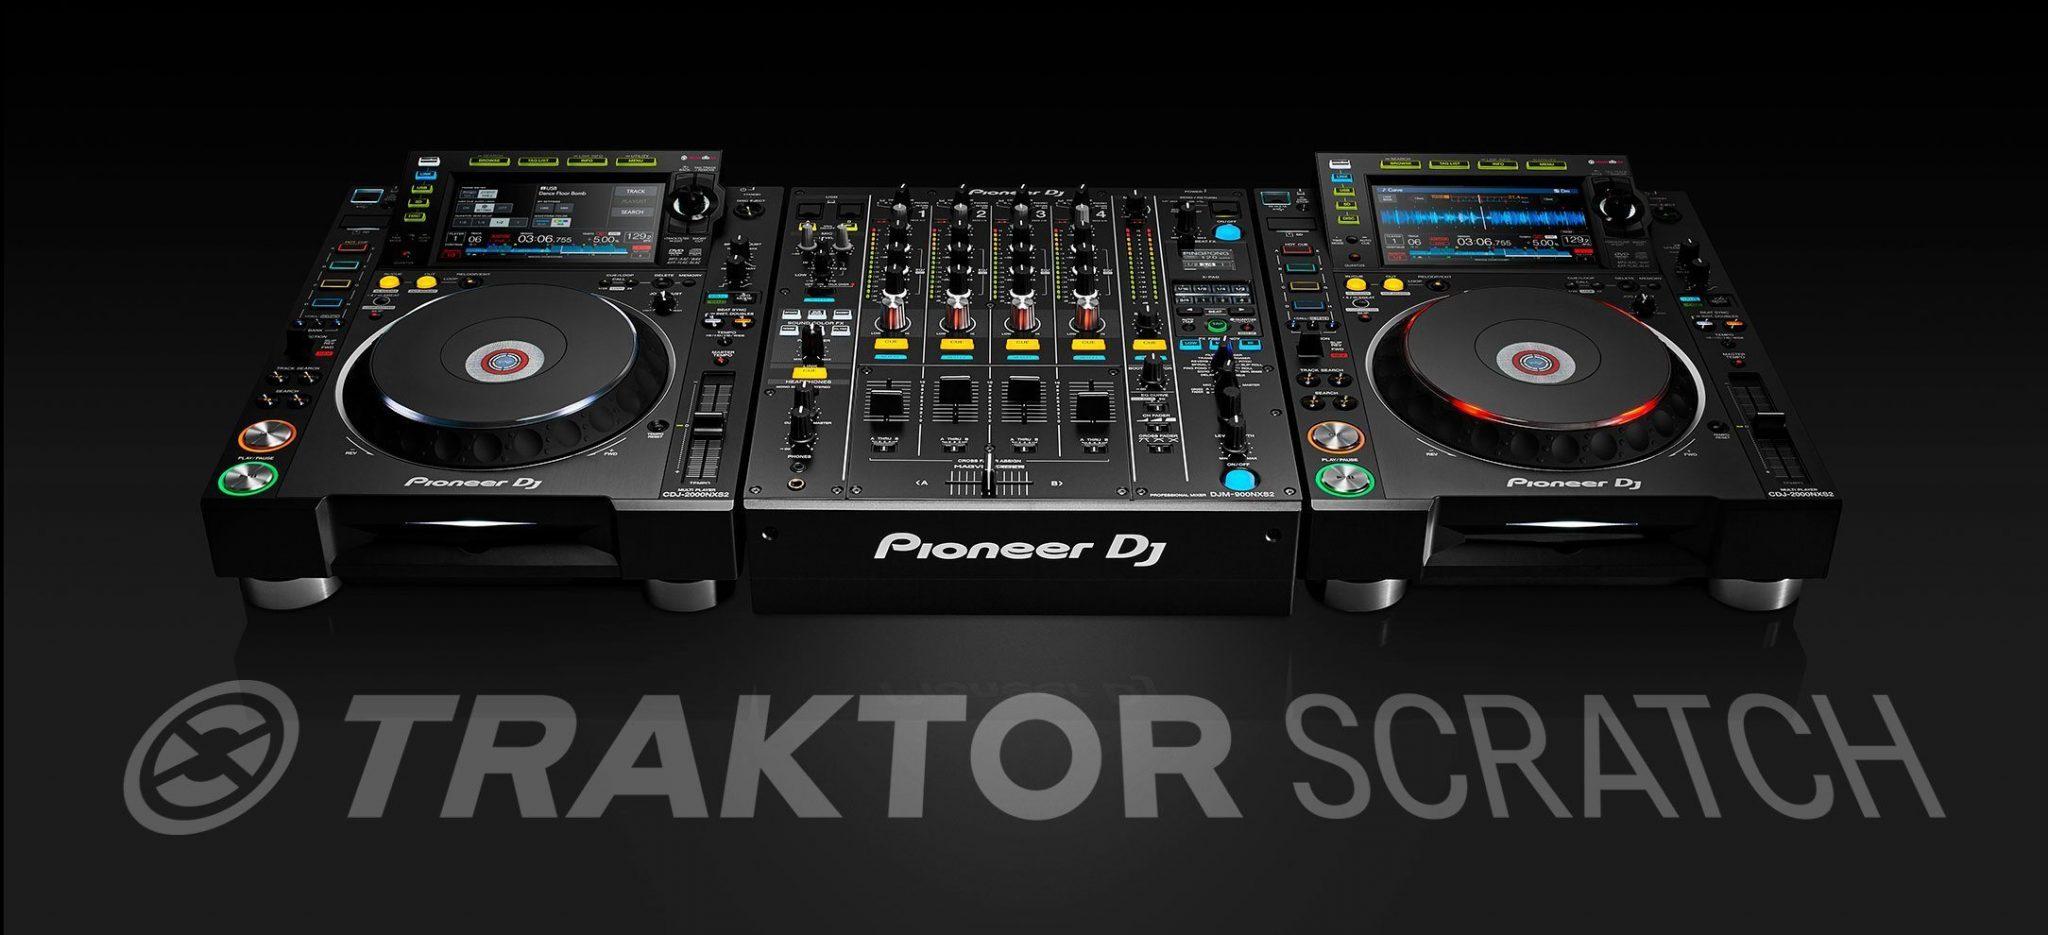 Friends again: Traktor and Pioneer DJ NXS2 are BFFs | DJWORX